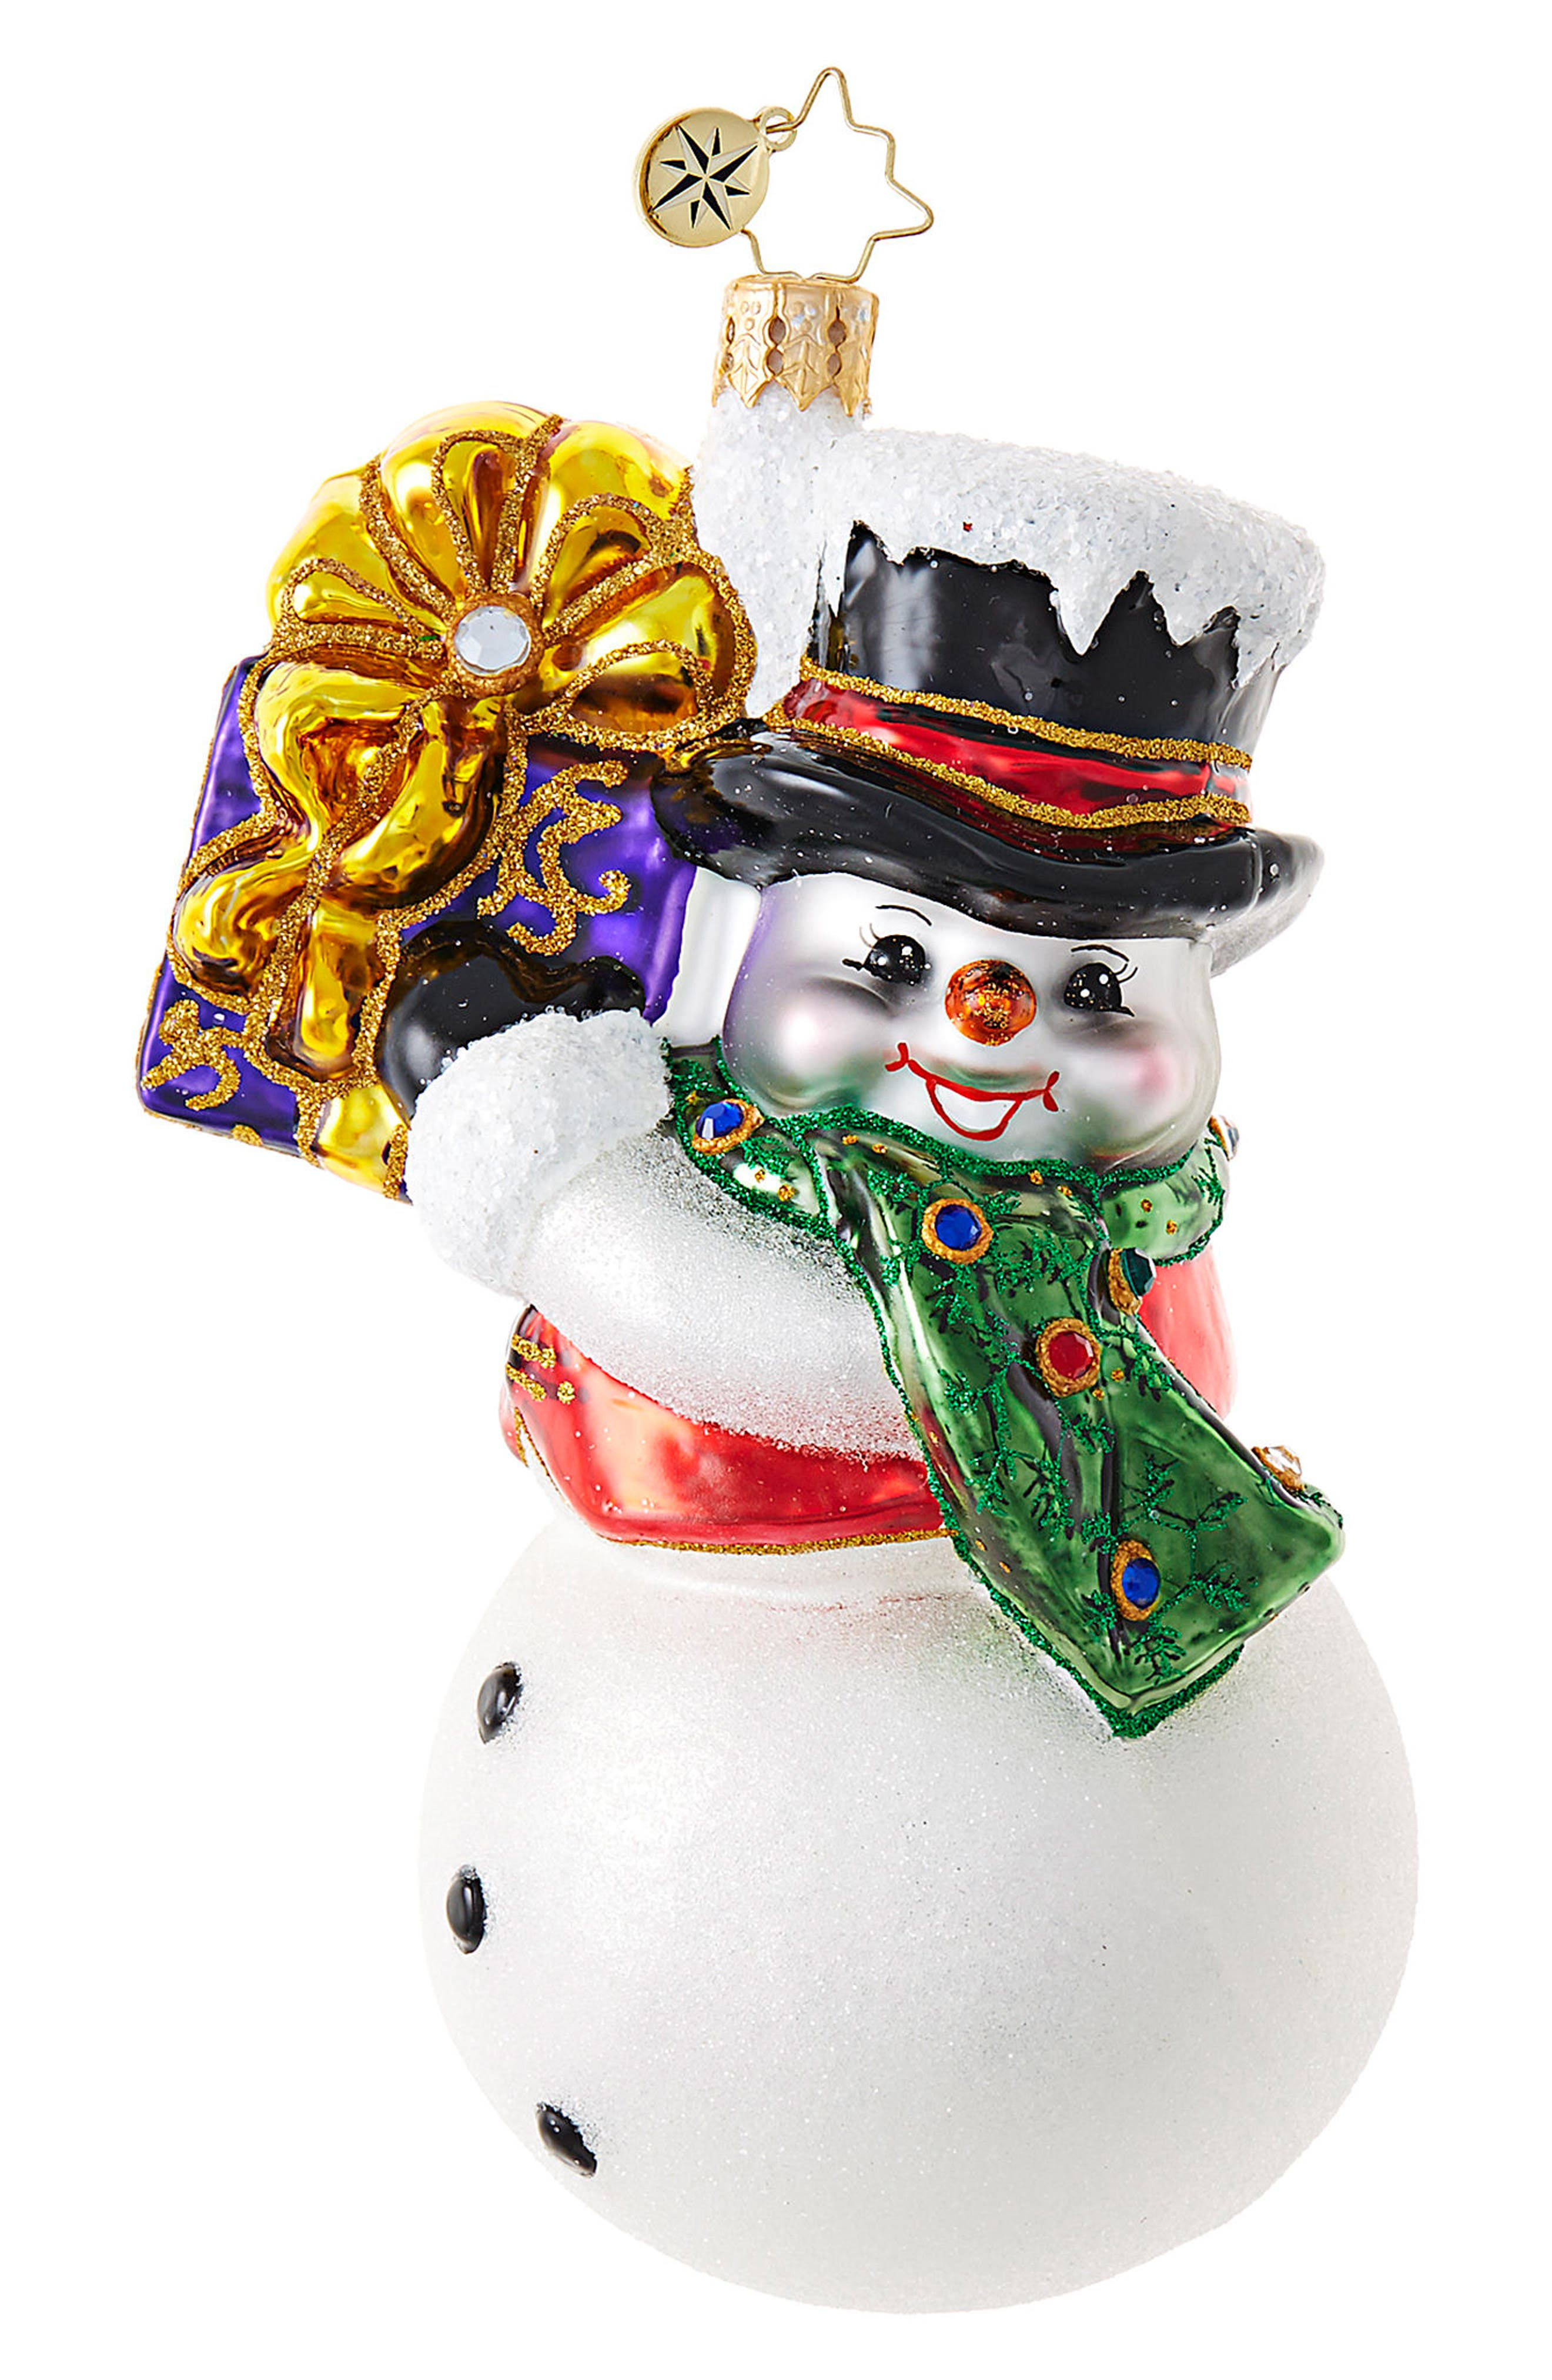 Main Image - Christopher Radko Shaking Things Up Snowman Ornament